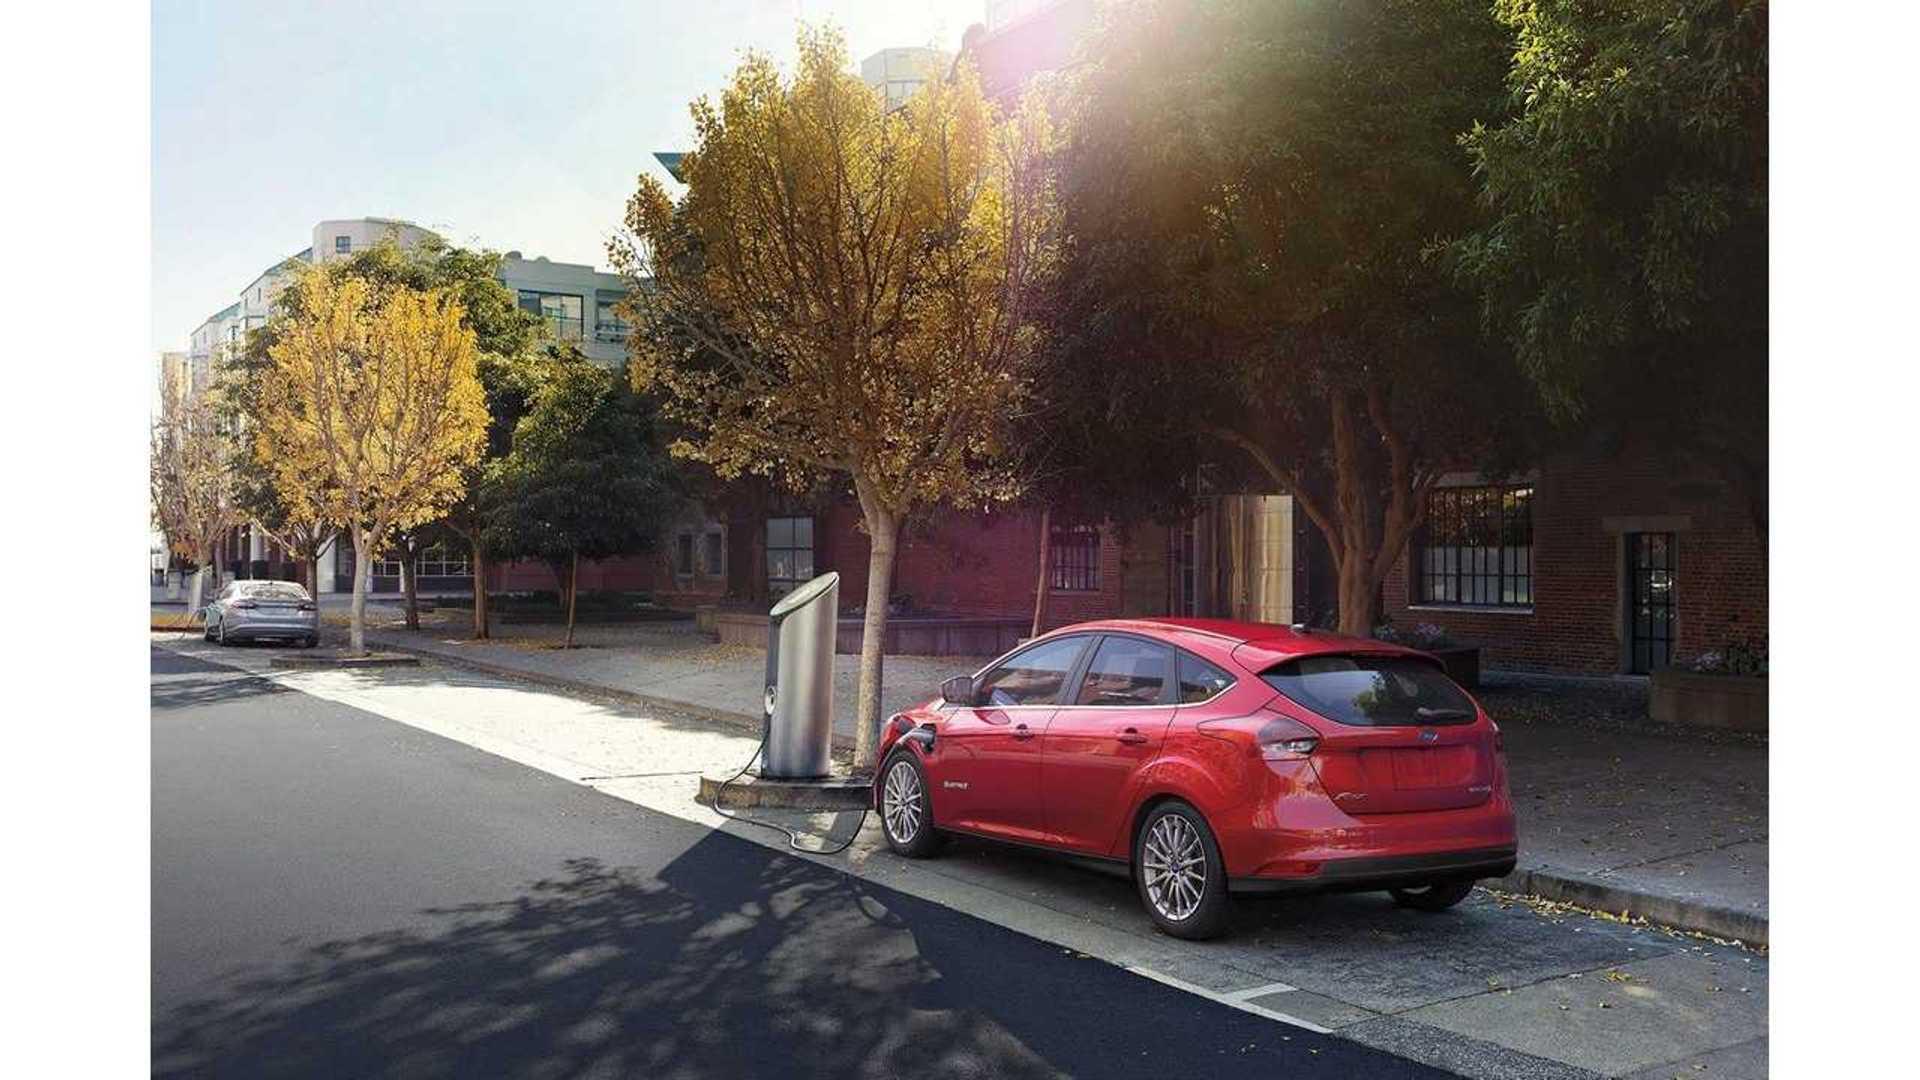 Volkswagen E Golf Vs Ford Focus Electric Comparison Range Test Video